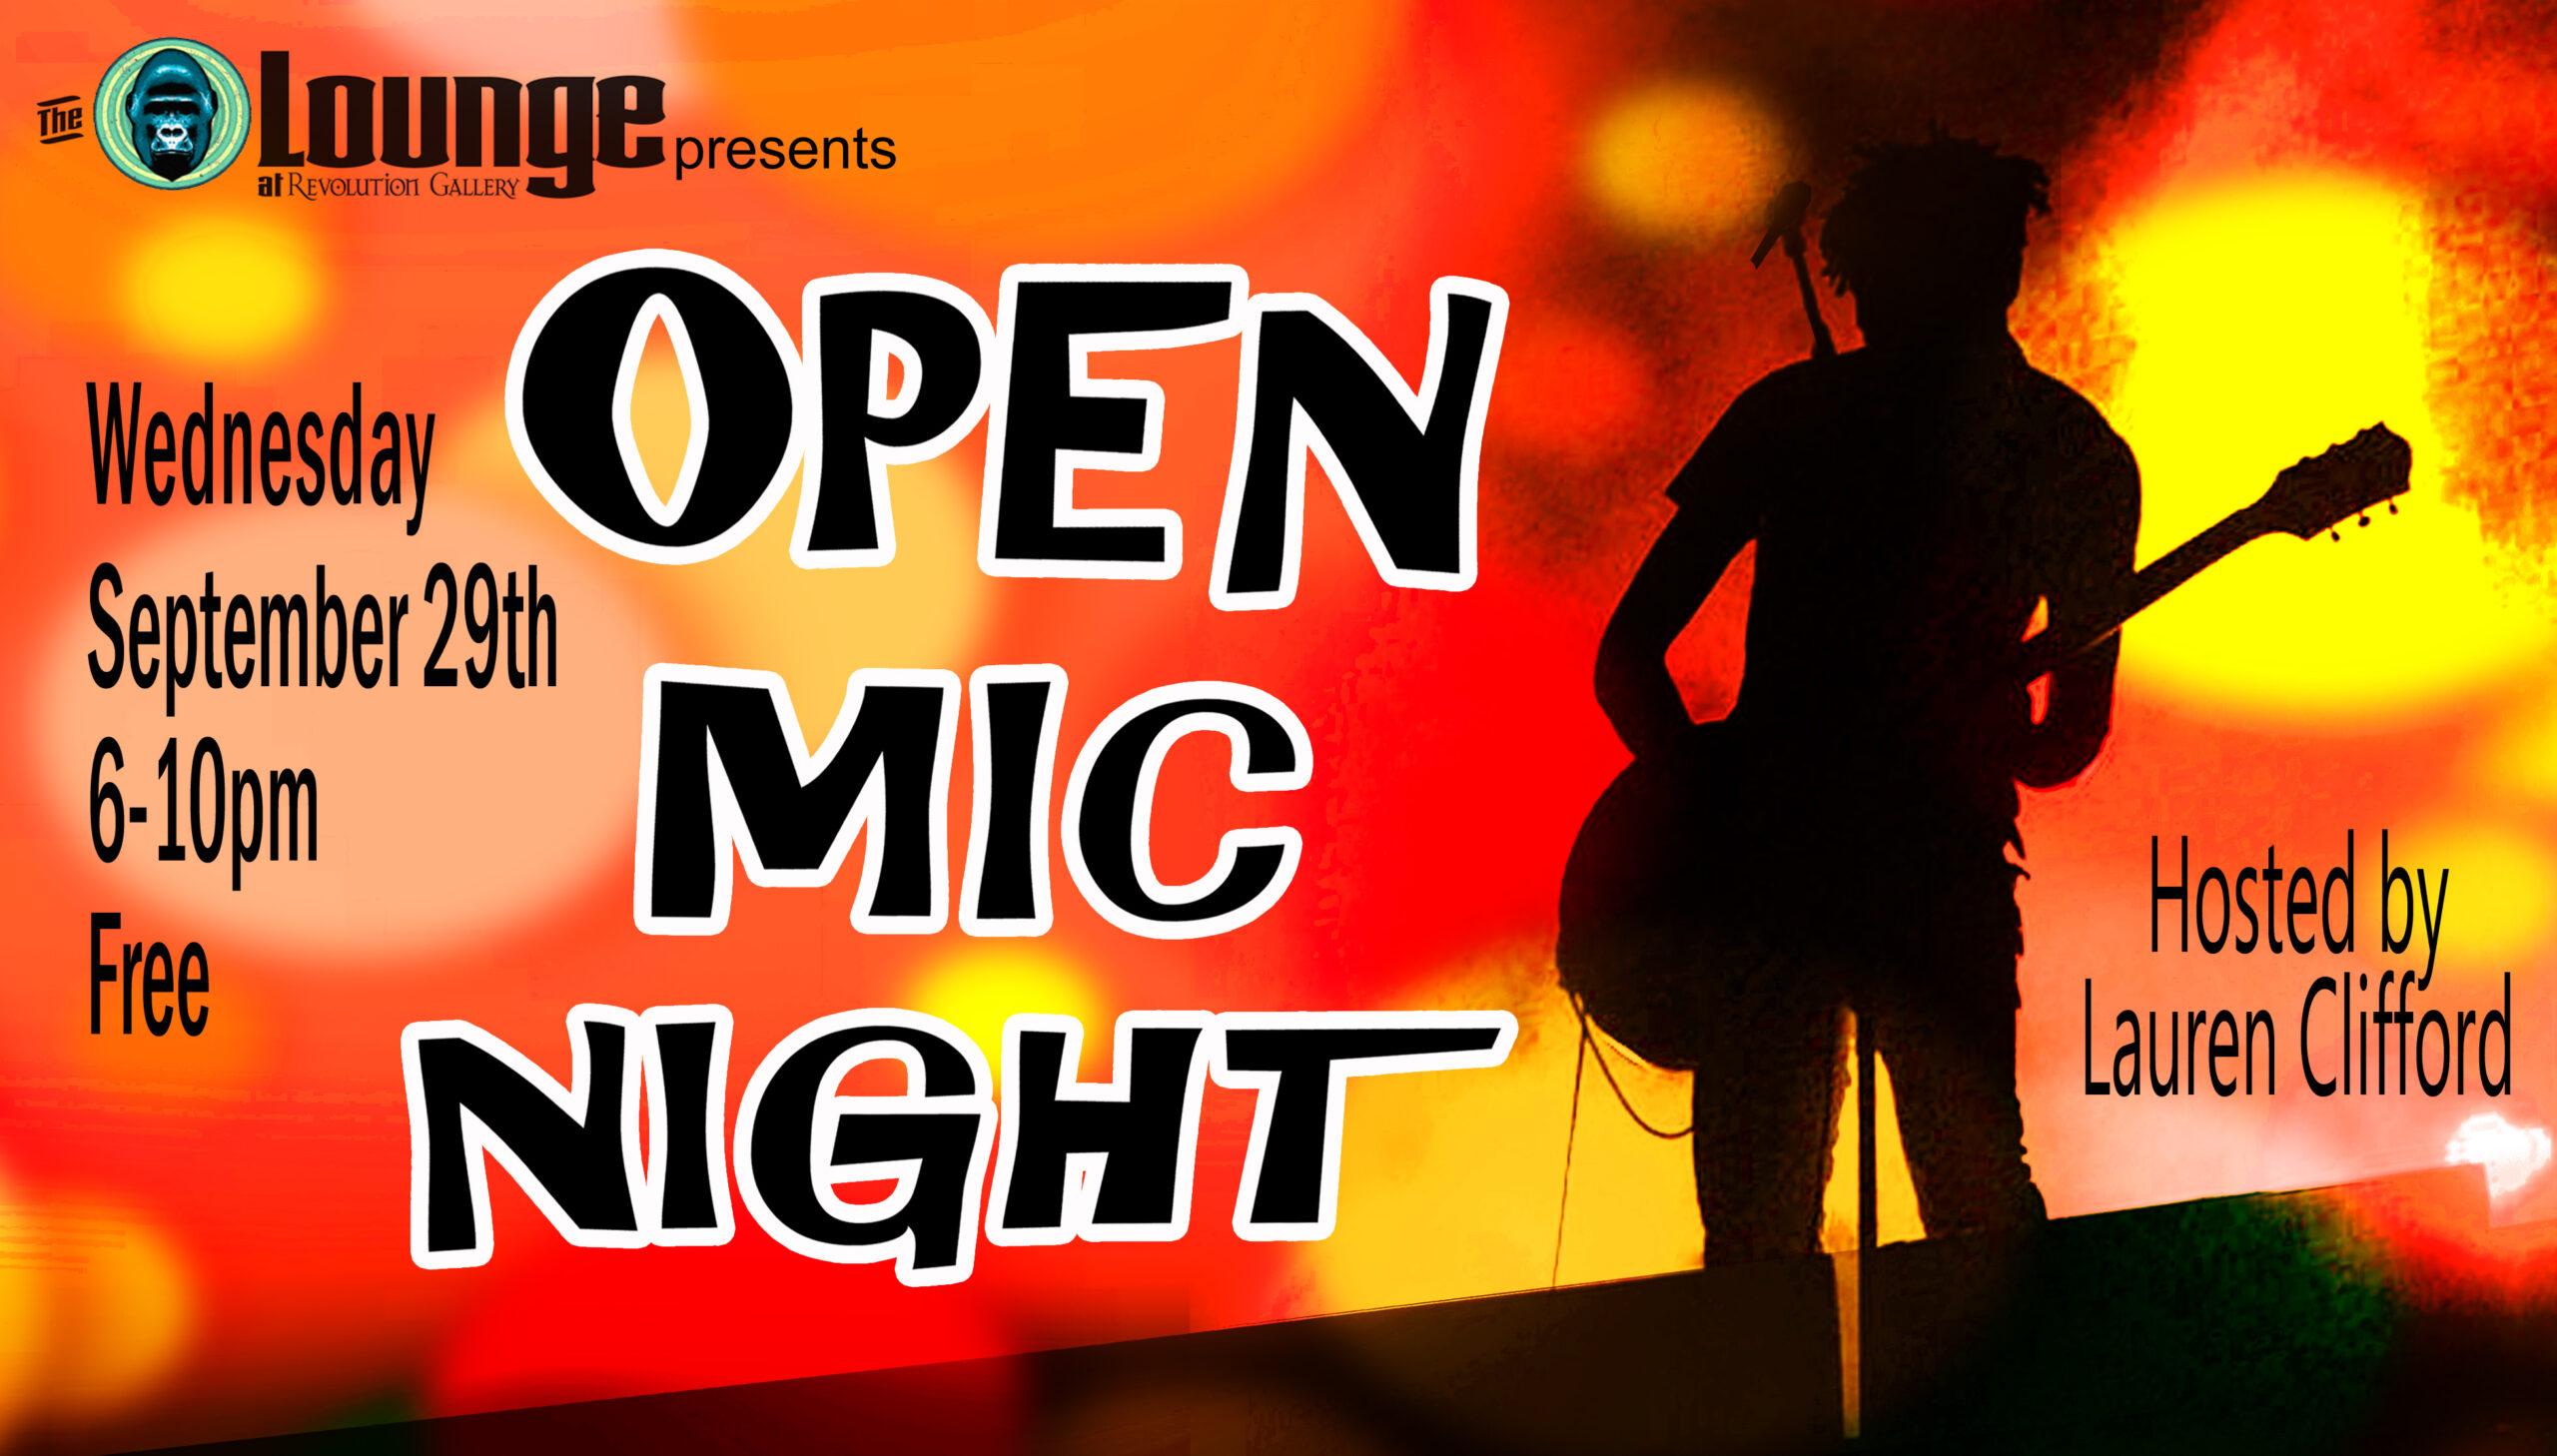 open_mic_promo_banner_2021-9-29-21